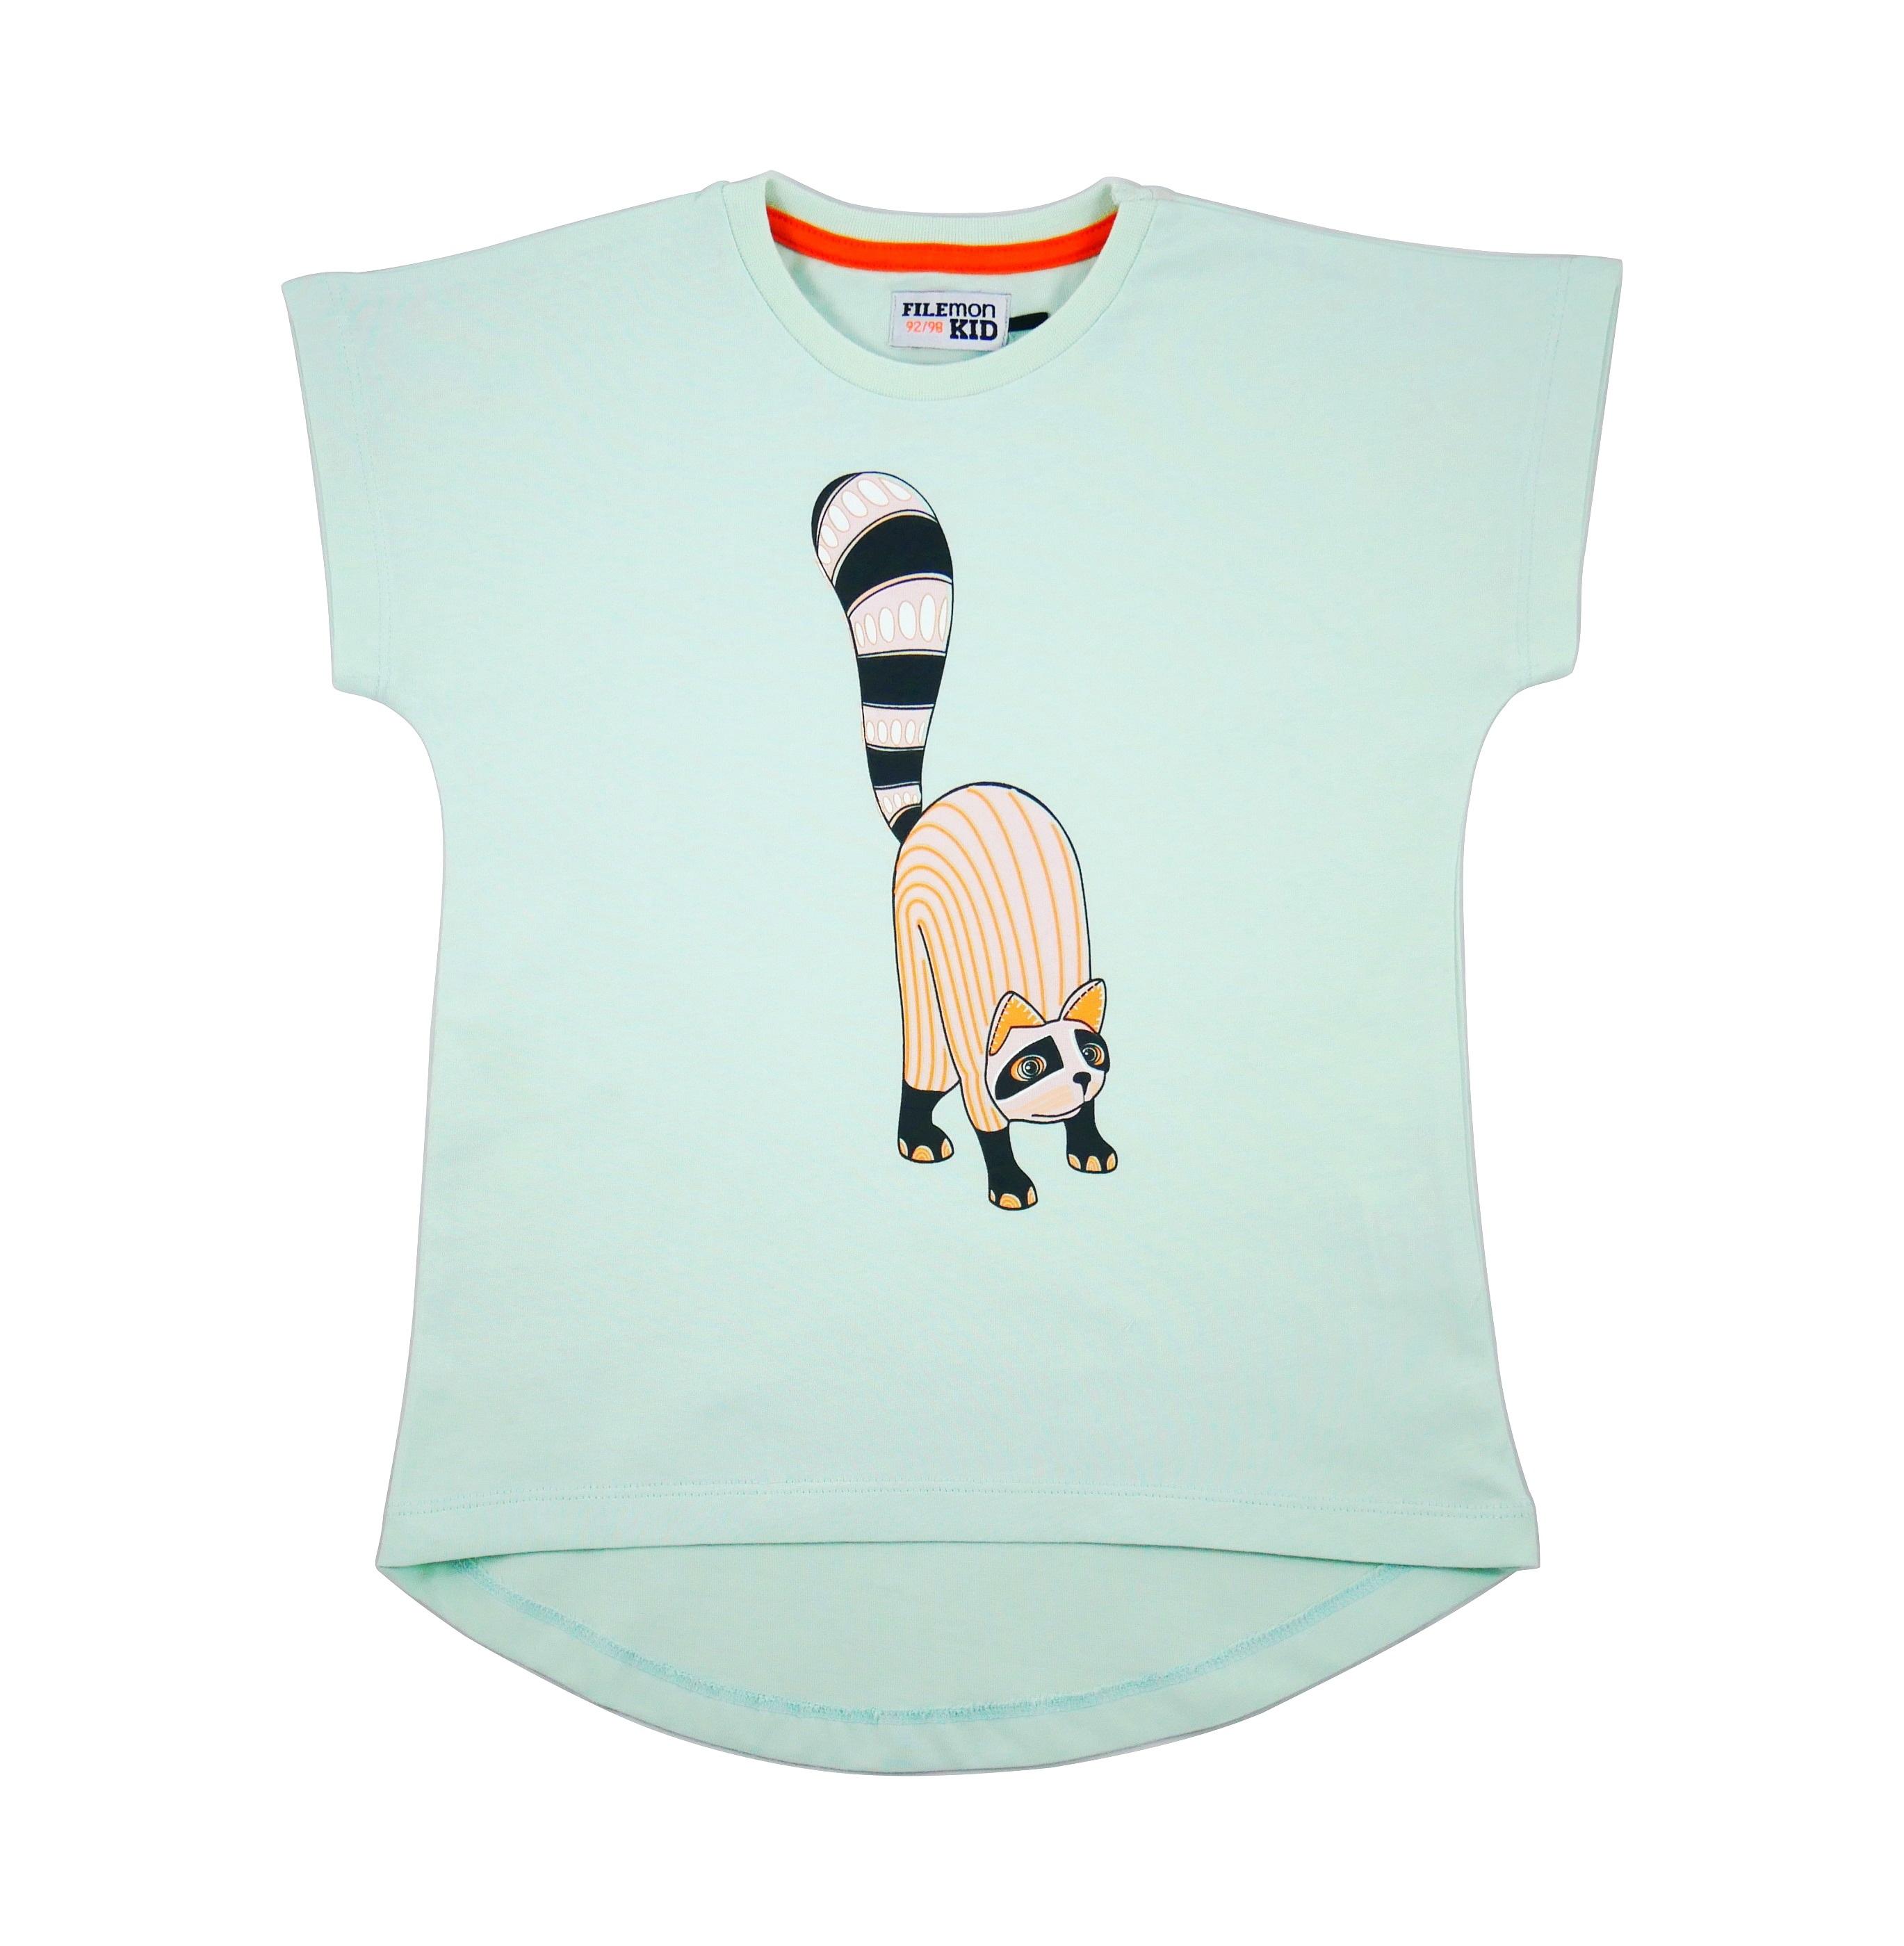 19SSTOA T-shirt Oaxacan Aqua